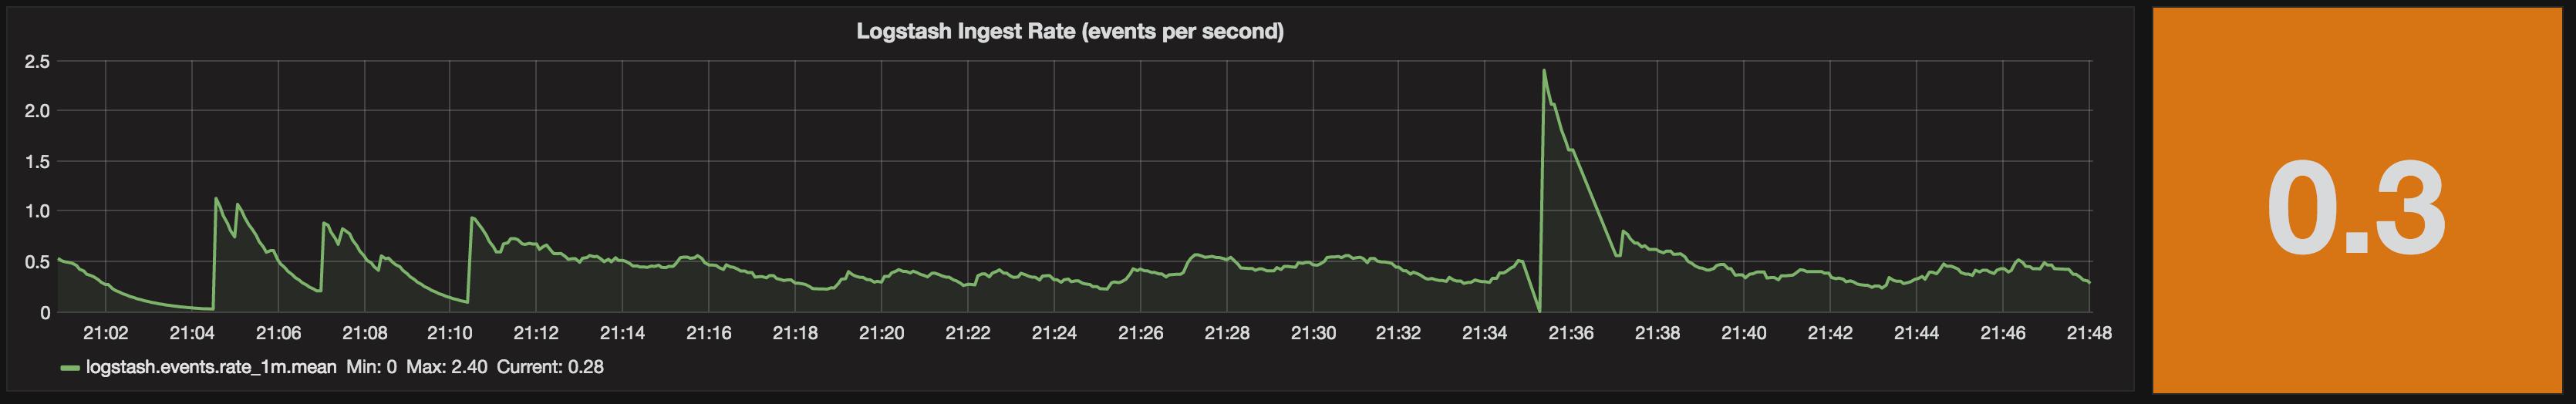 Monitoring Logstash Ingest Rates with InfluxDB and Grafana